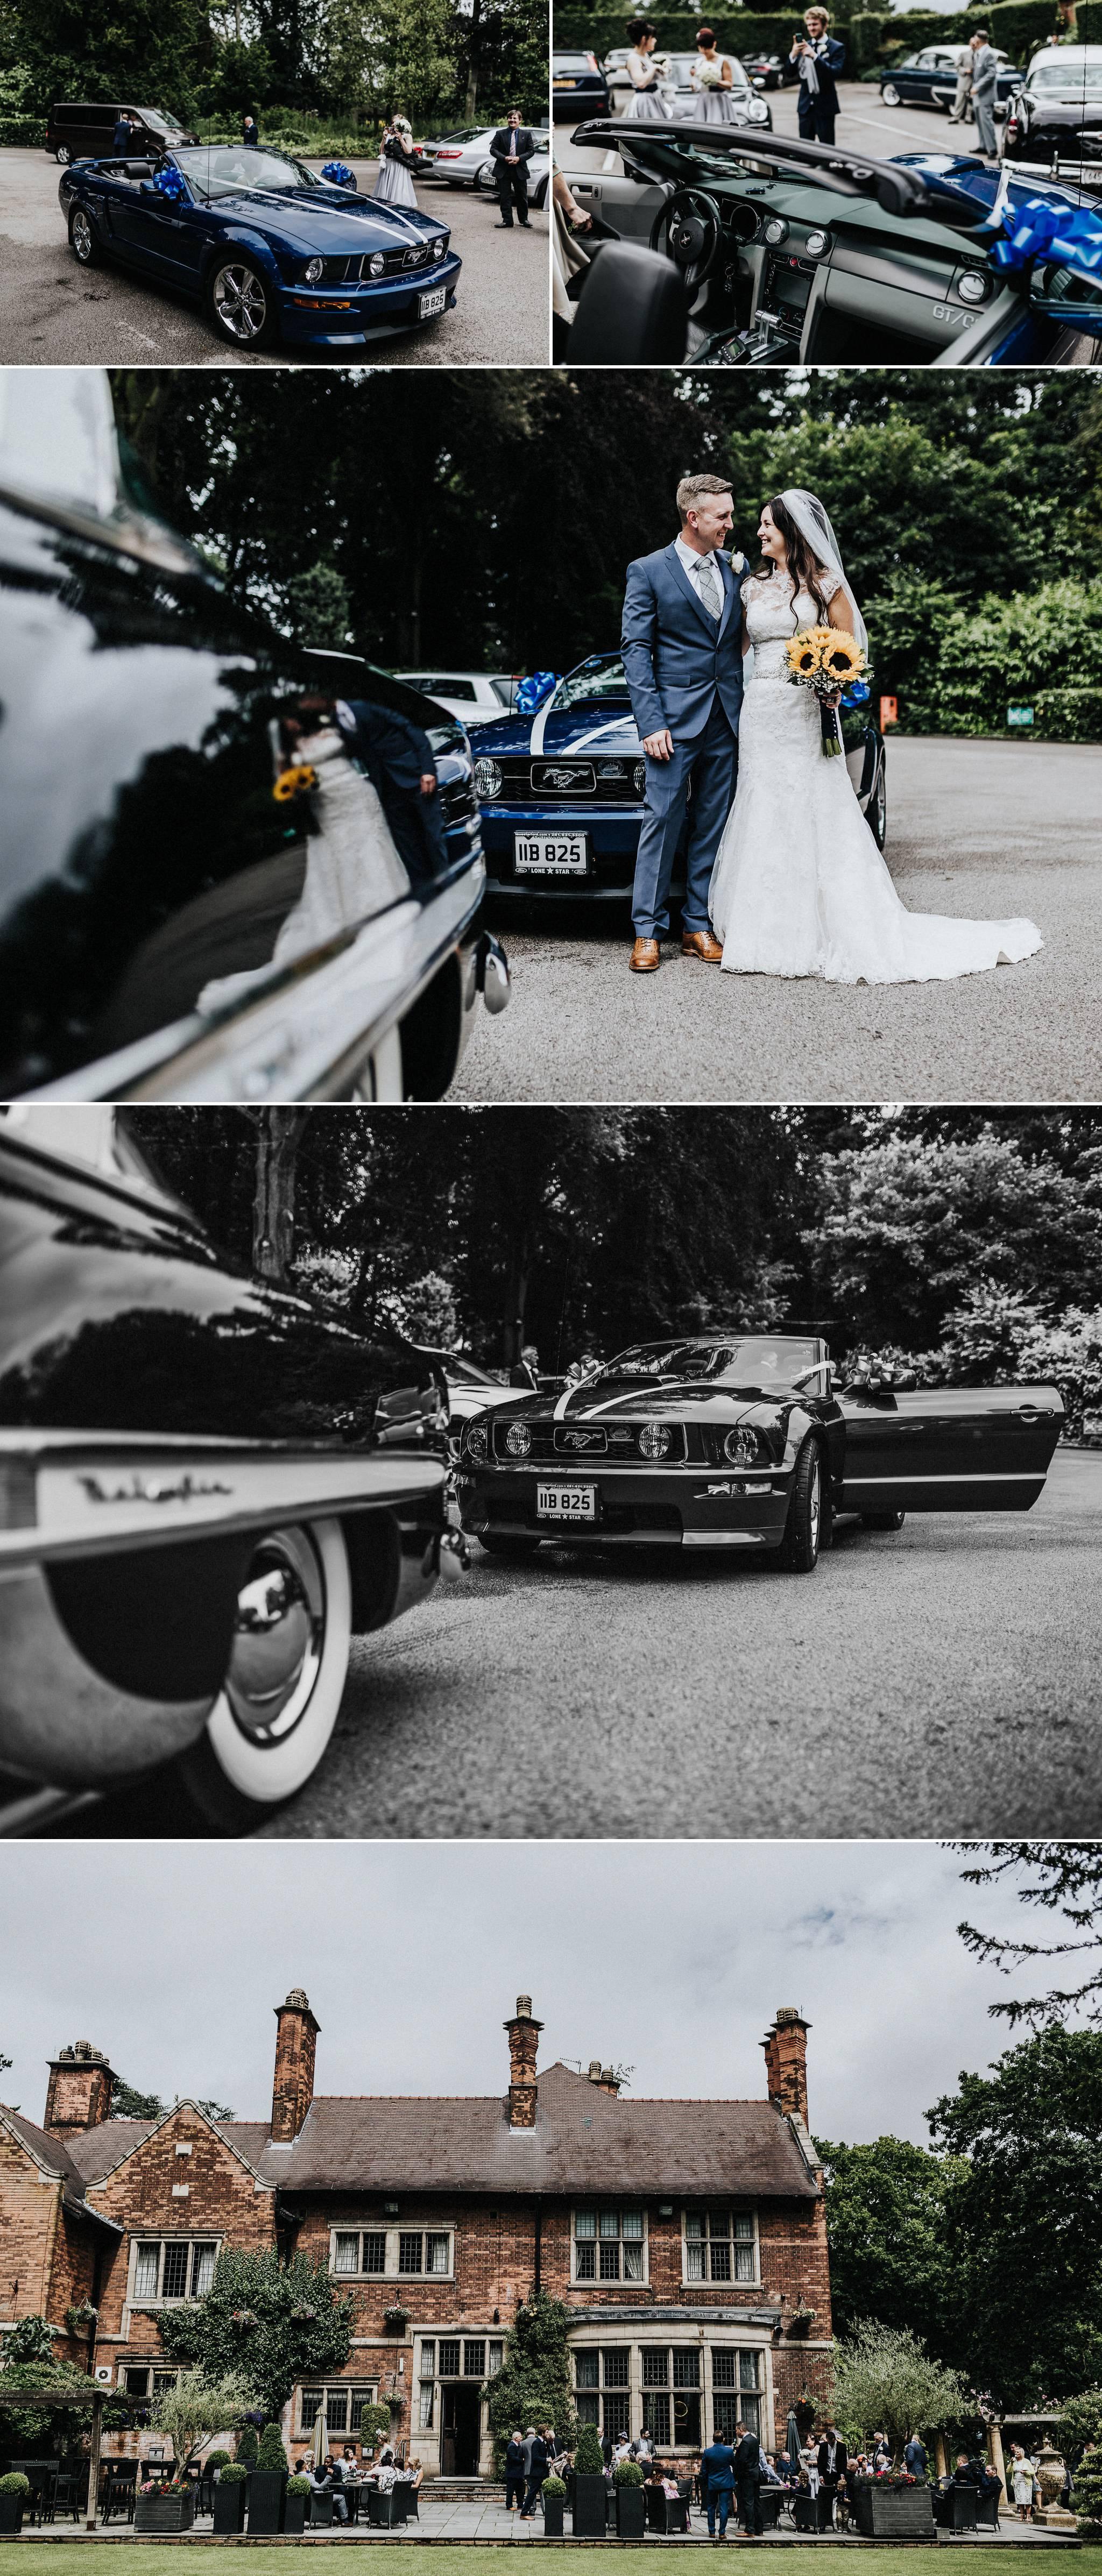 moxhull-hall-wedding-photography 11.jpg